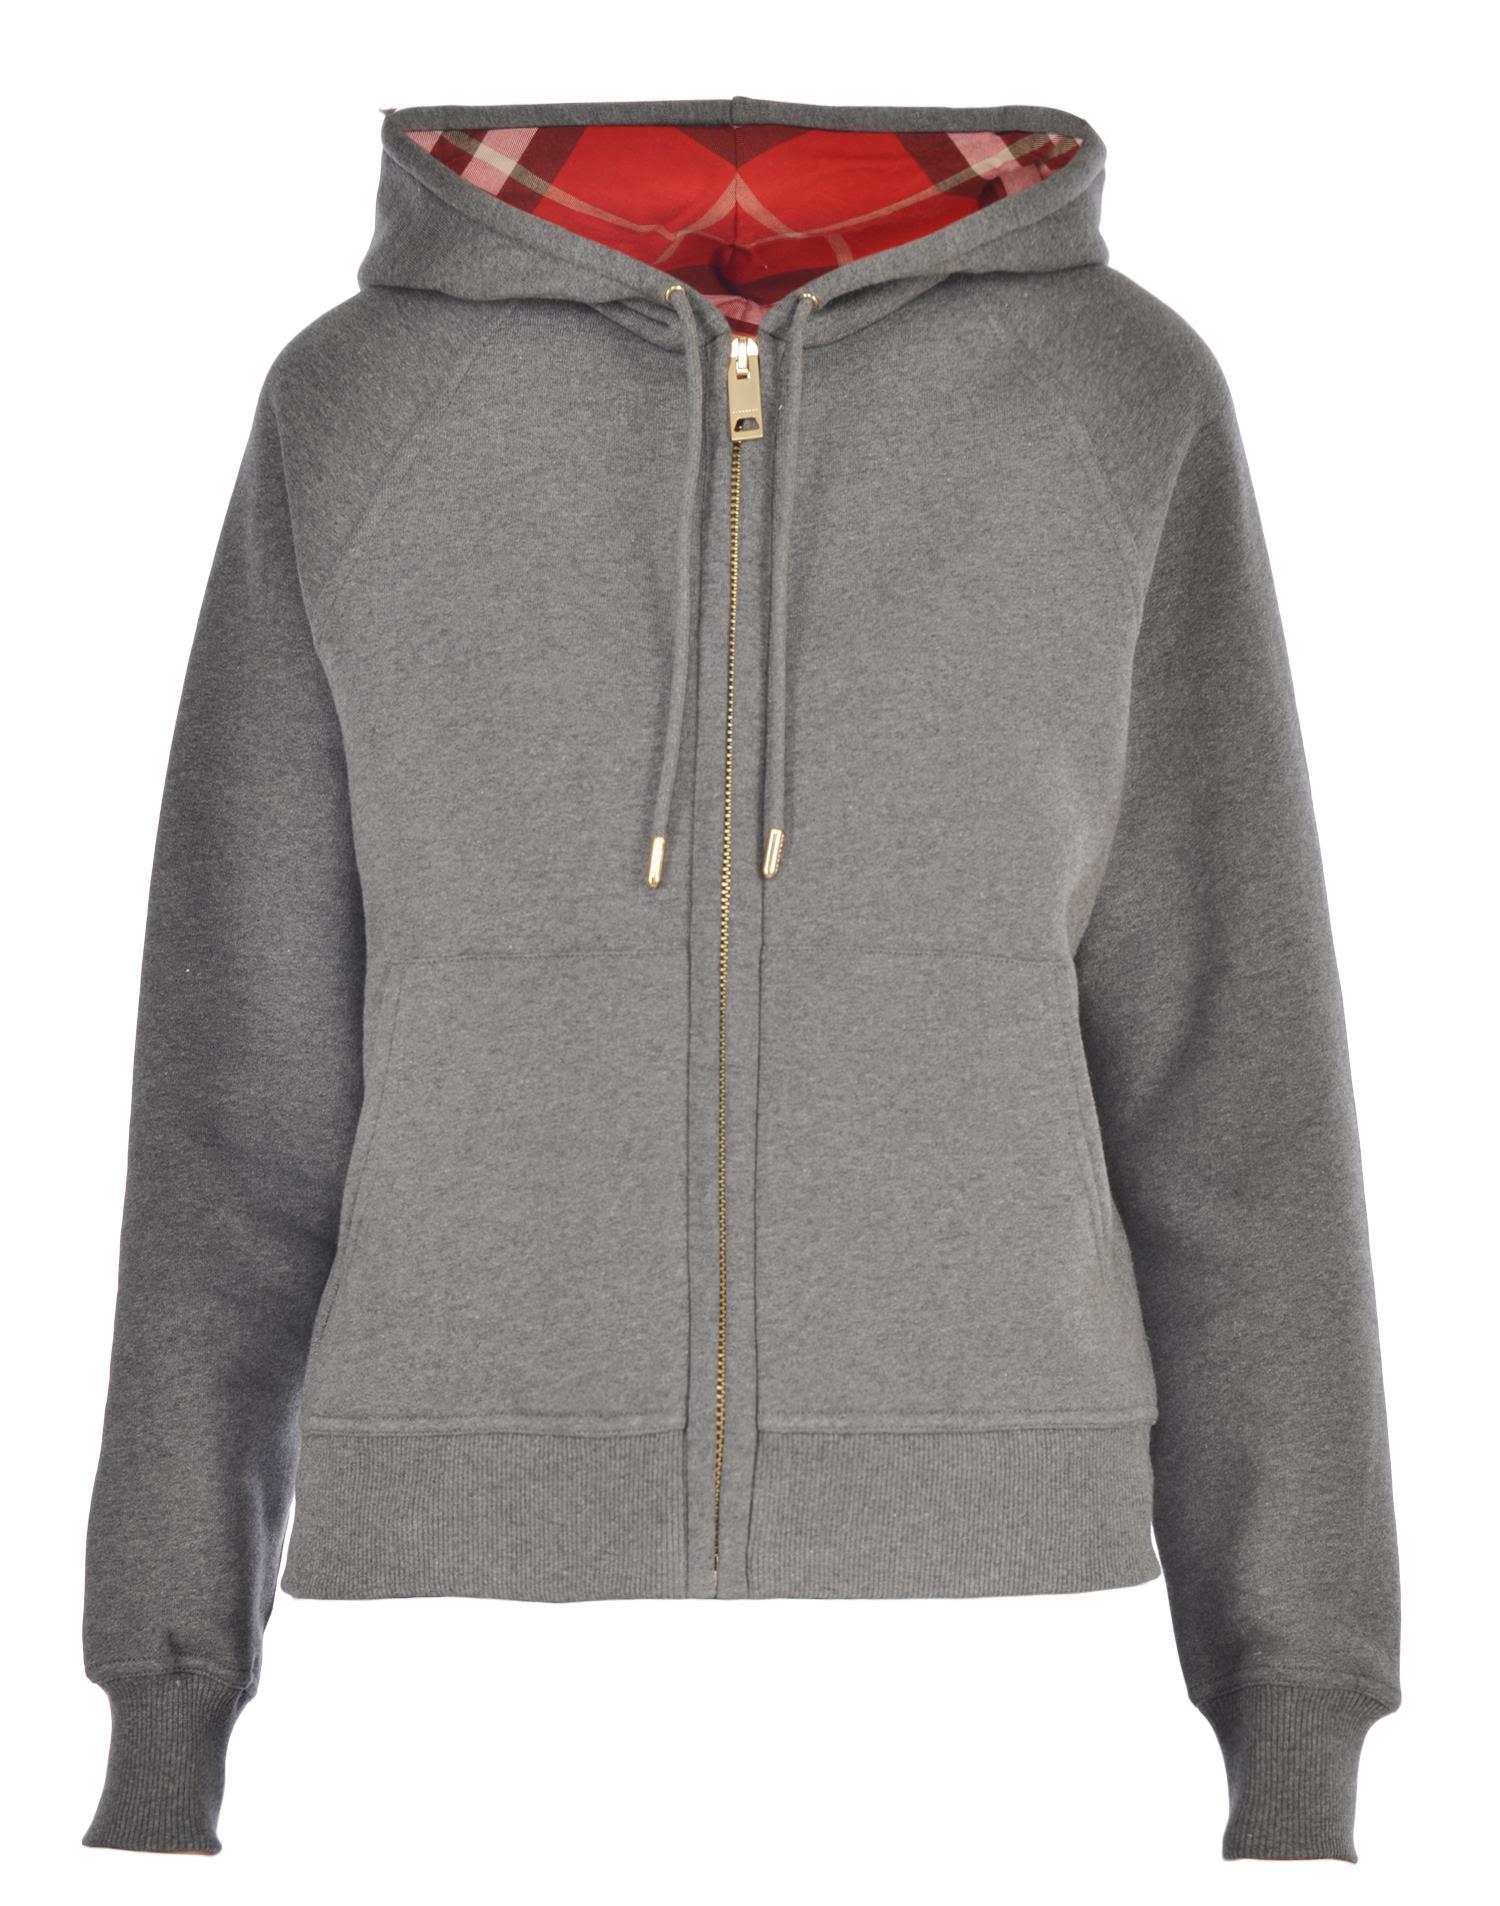 Burberry Cotton Sweatshirt